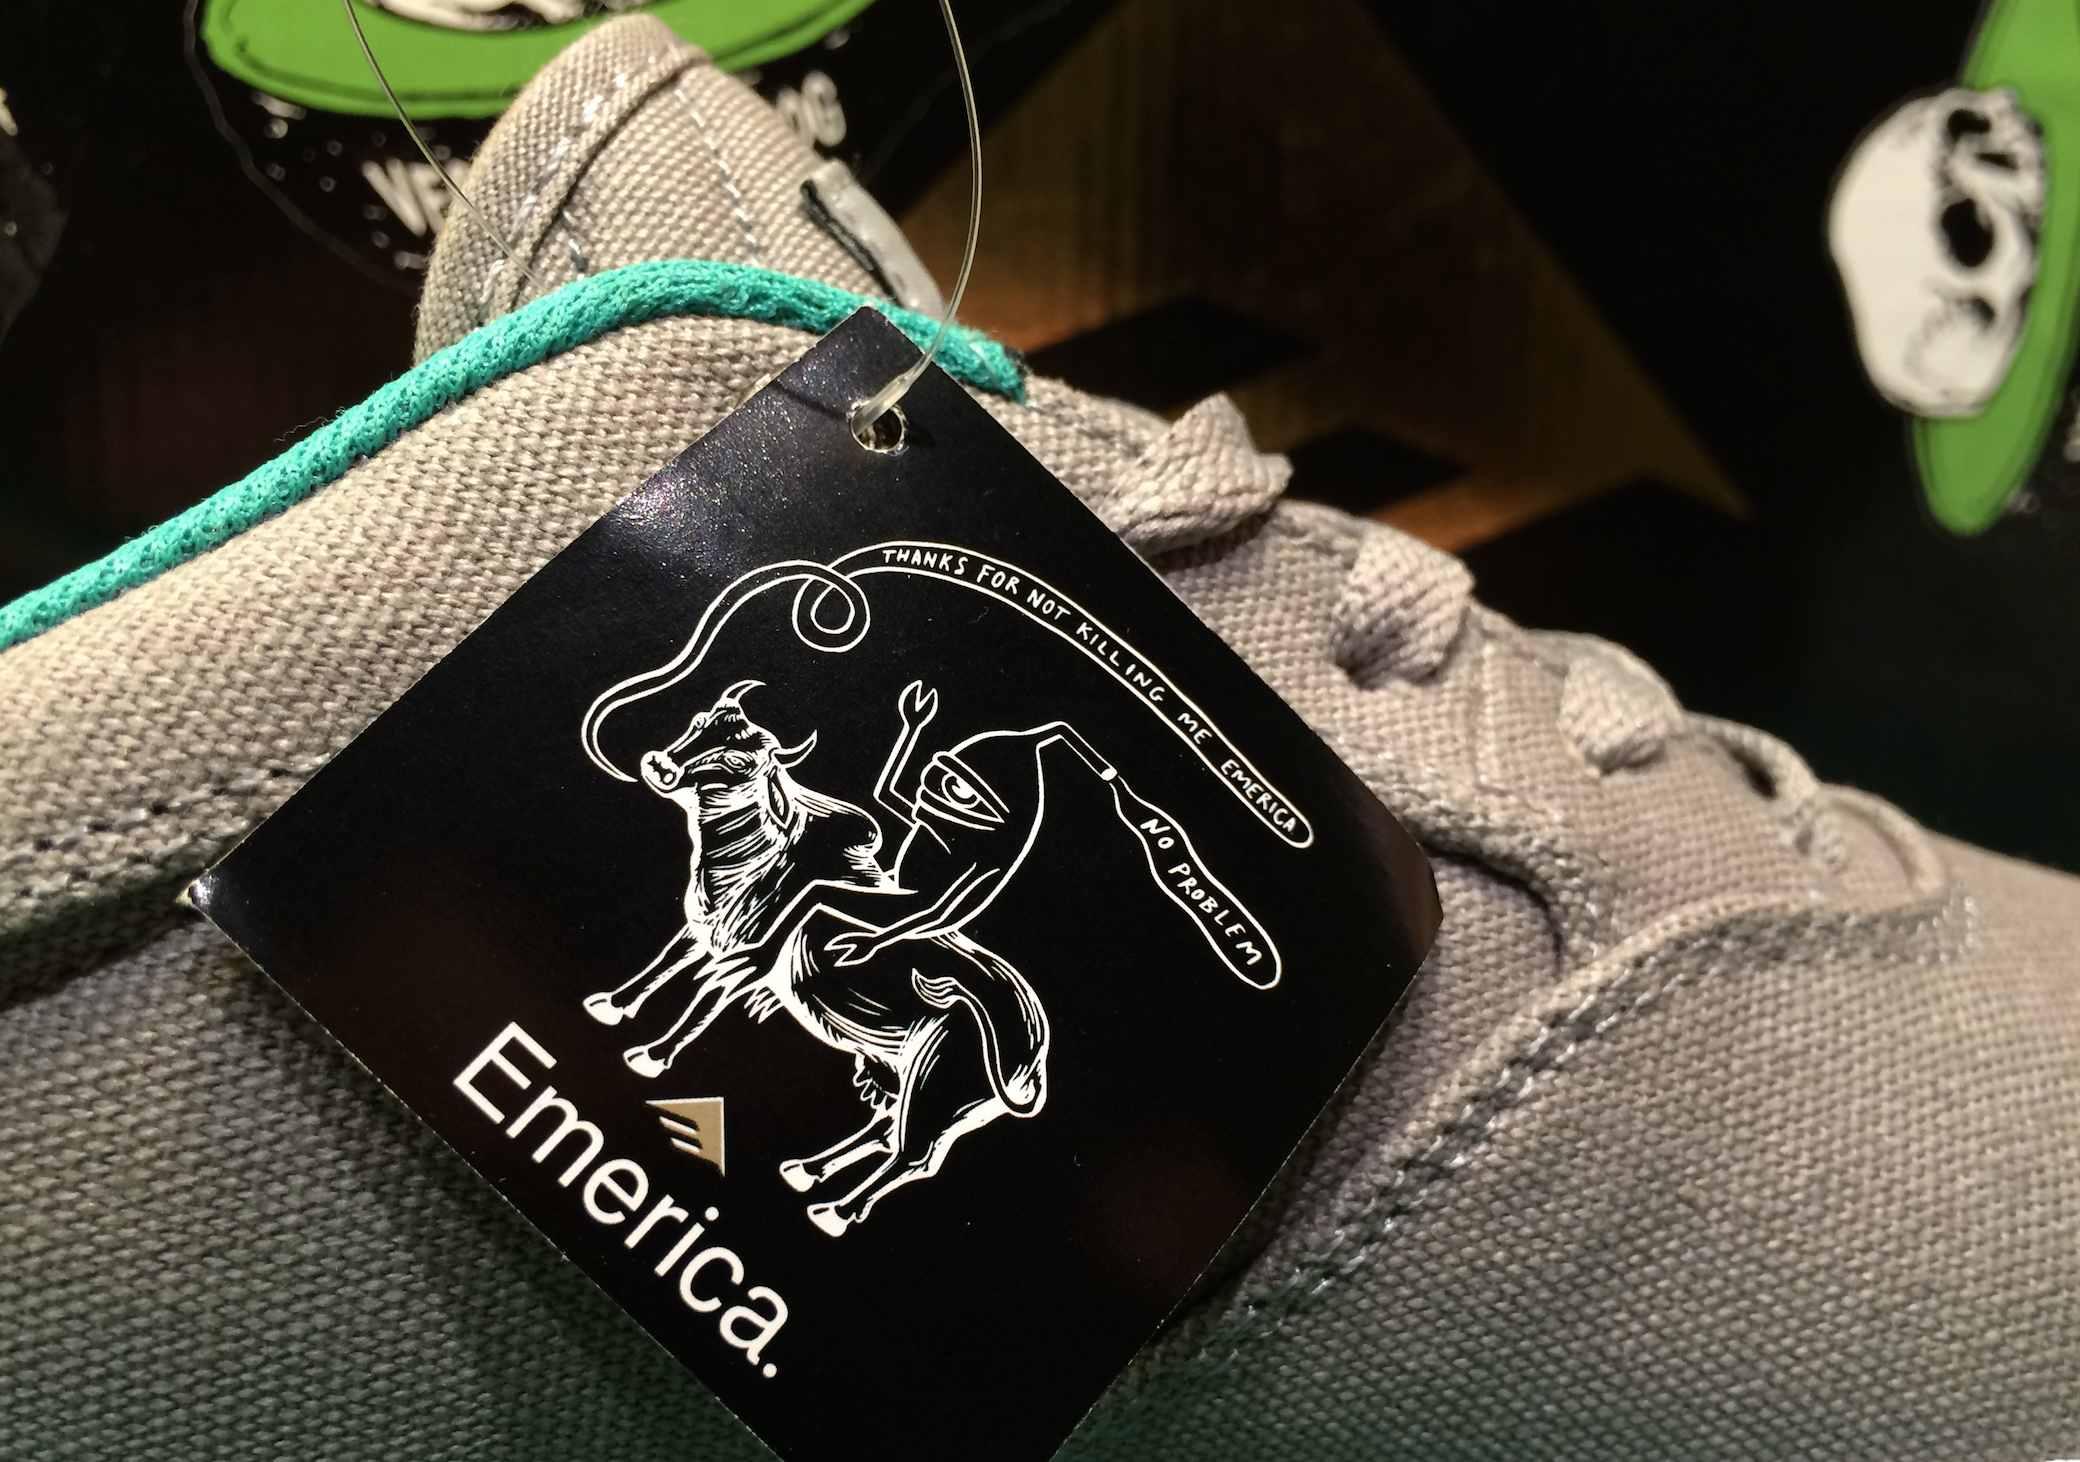 Emerica Herman G6 Vulc Vegan skateboarding shoes